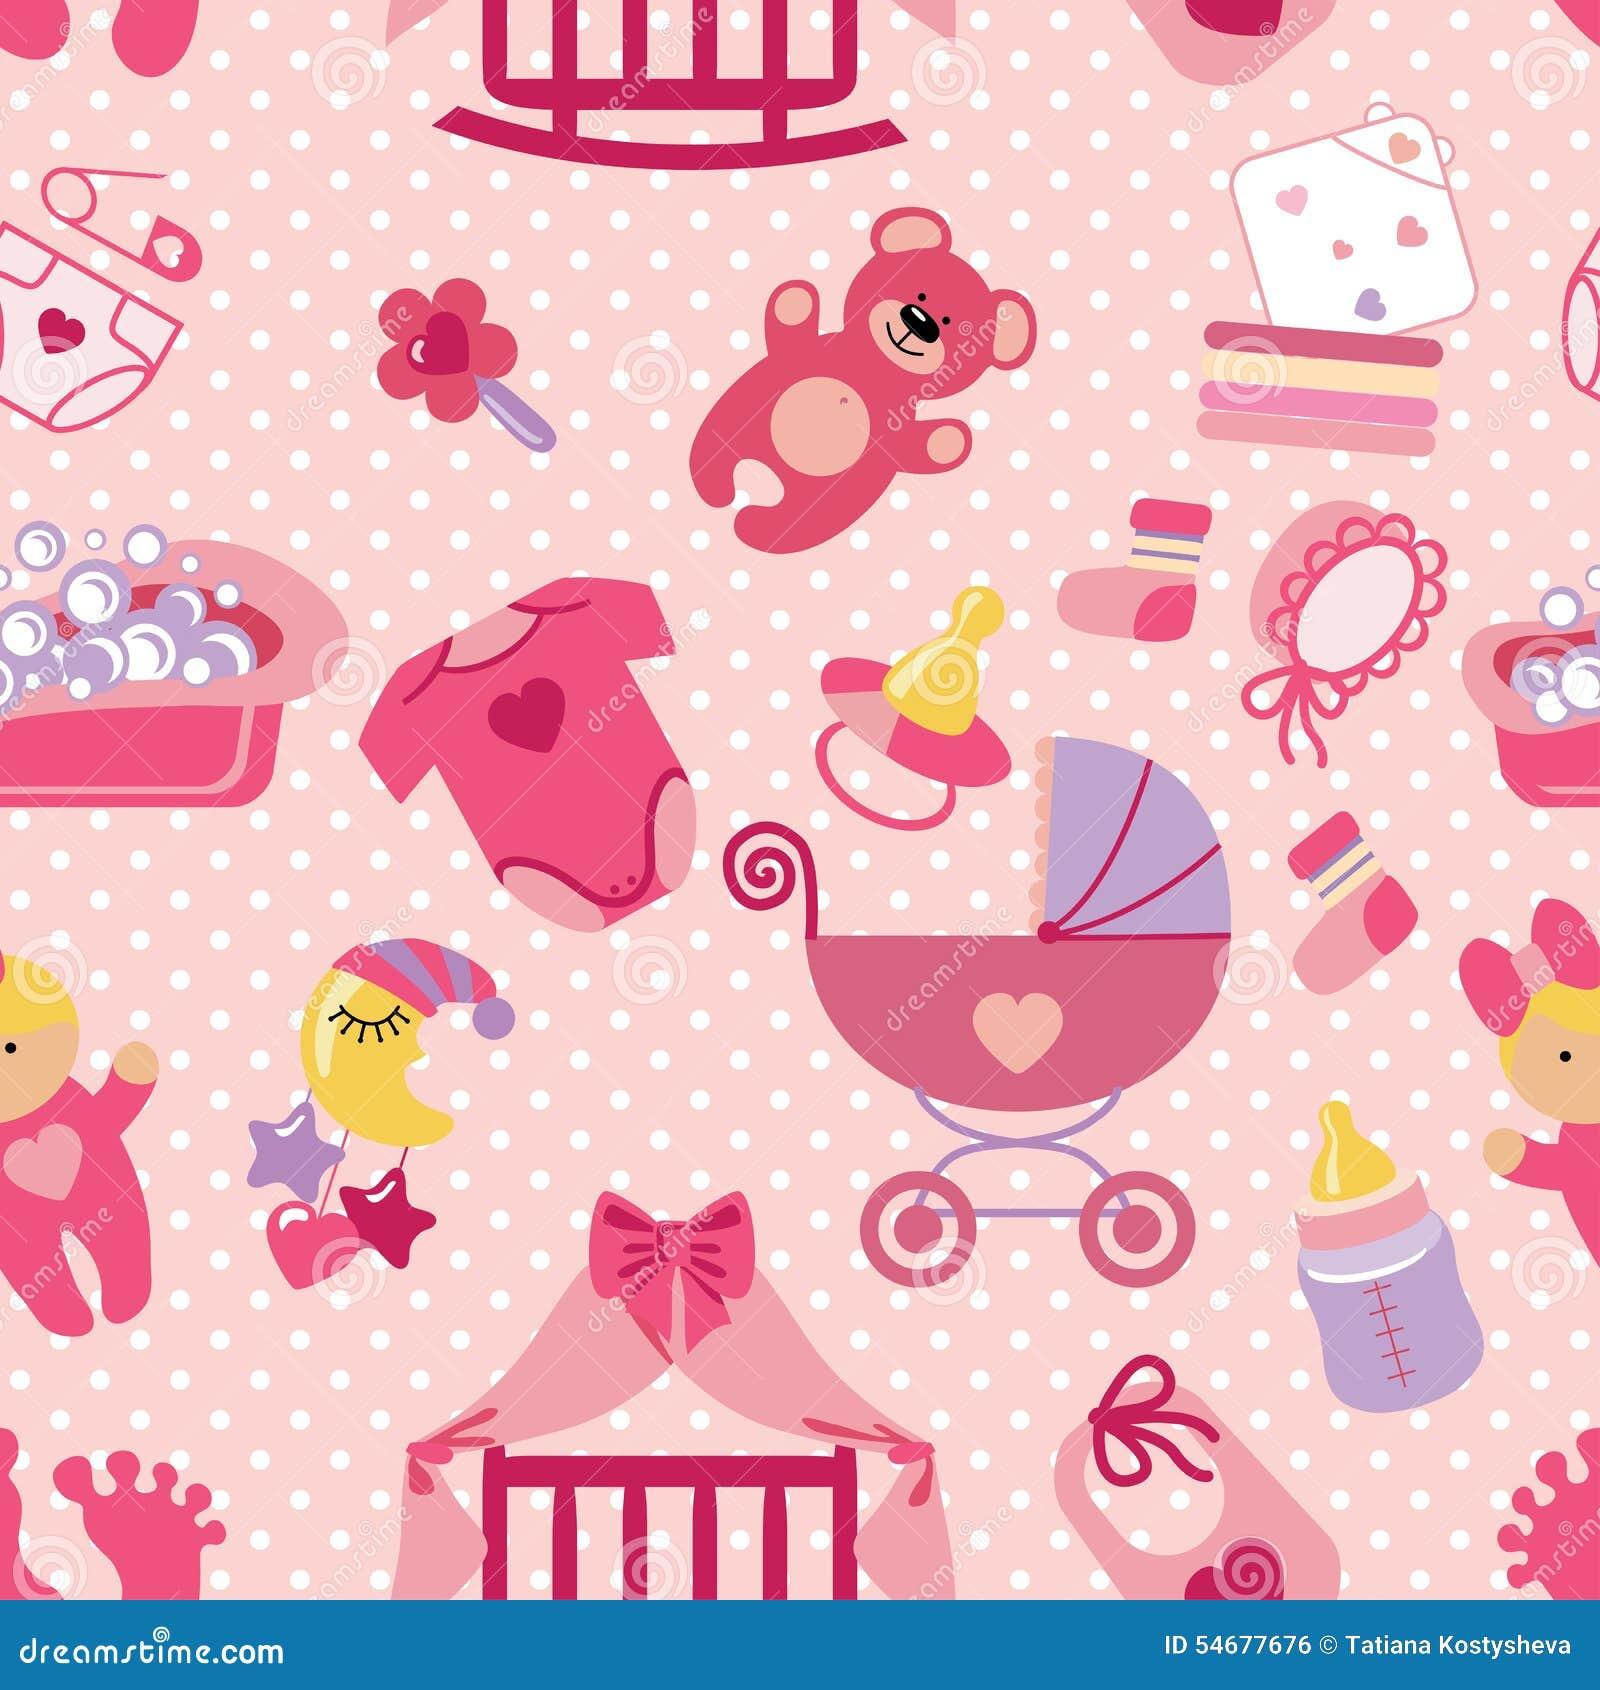 Stock Illustration Newborn Baby Girl Seamless Pattern Polka Dot Cute Shower Cartoon Design Elements Fabric Background Wallpaper Backdrop Image54677676 on Boy Paper Doll